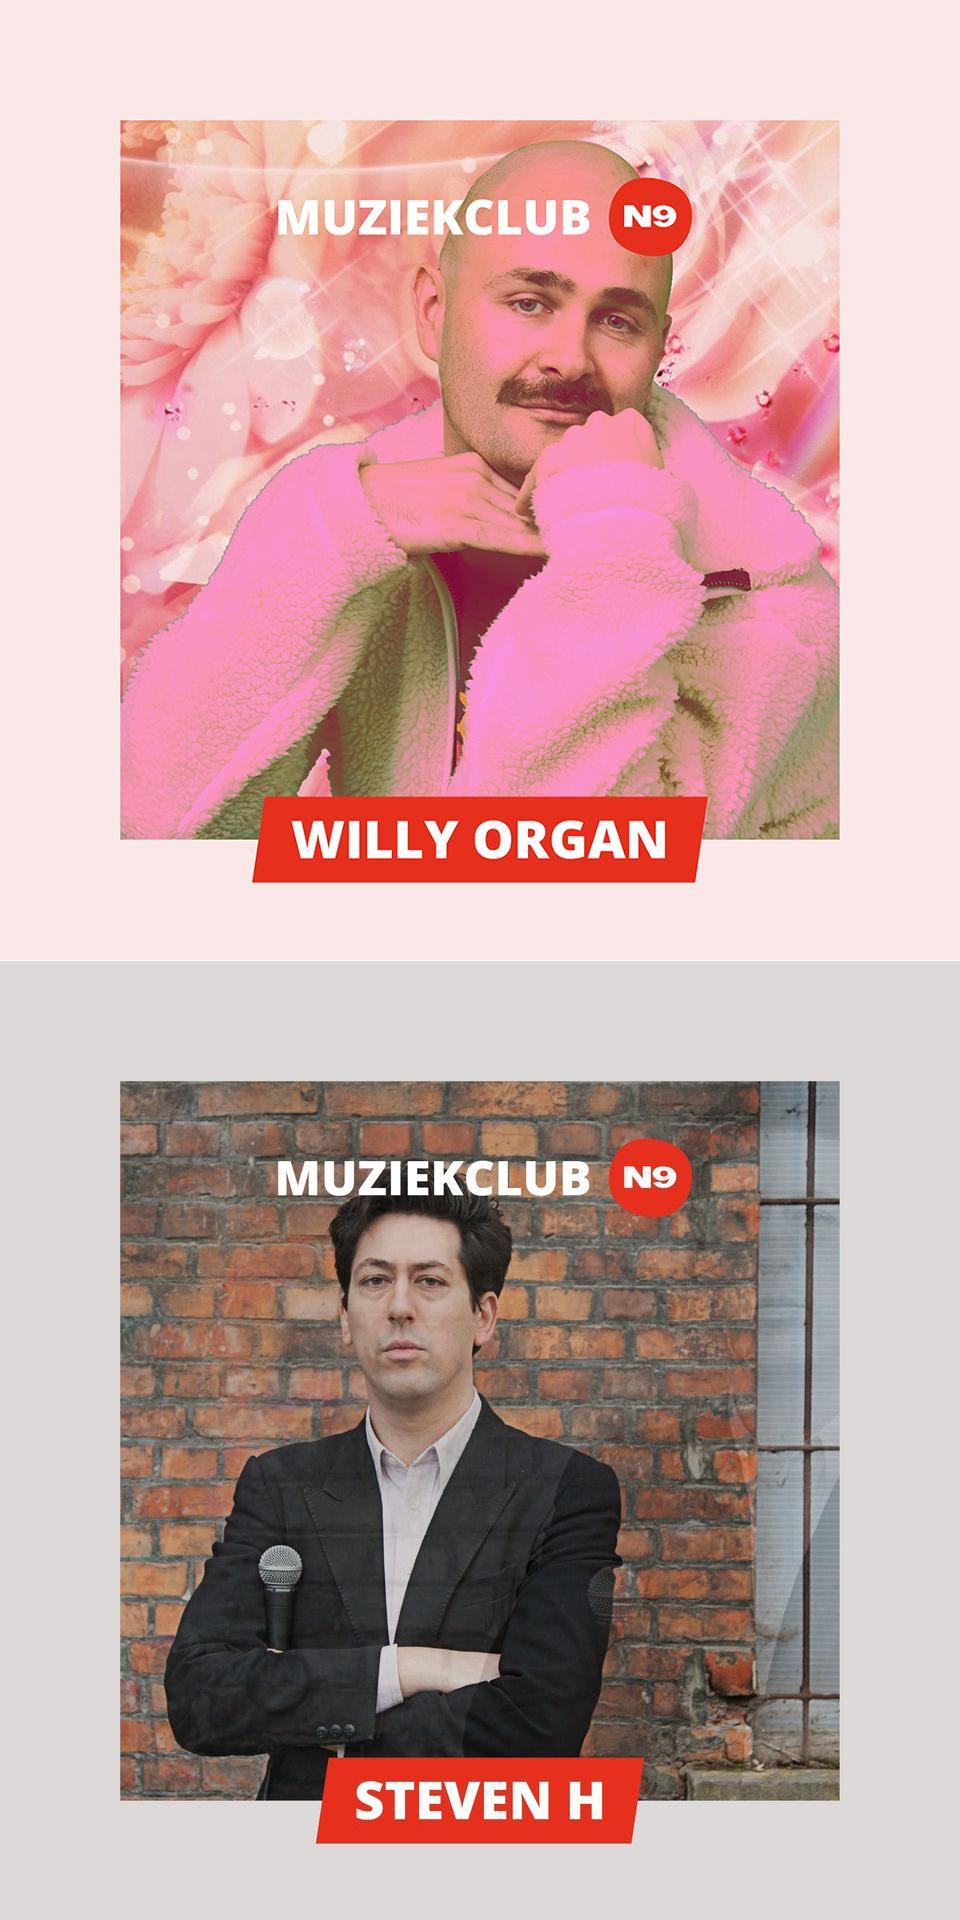 Willy Organ + Steven H - N9